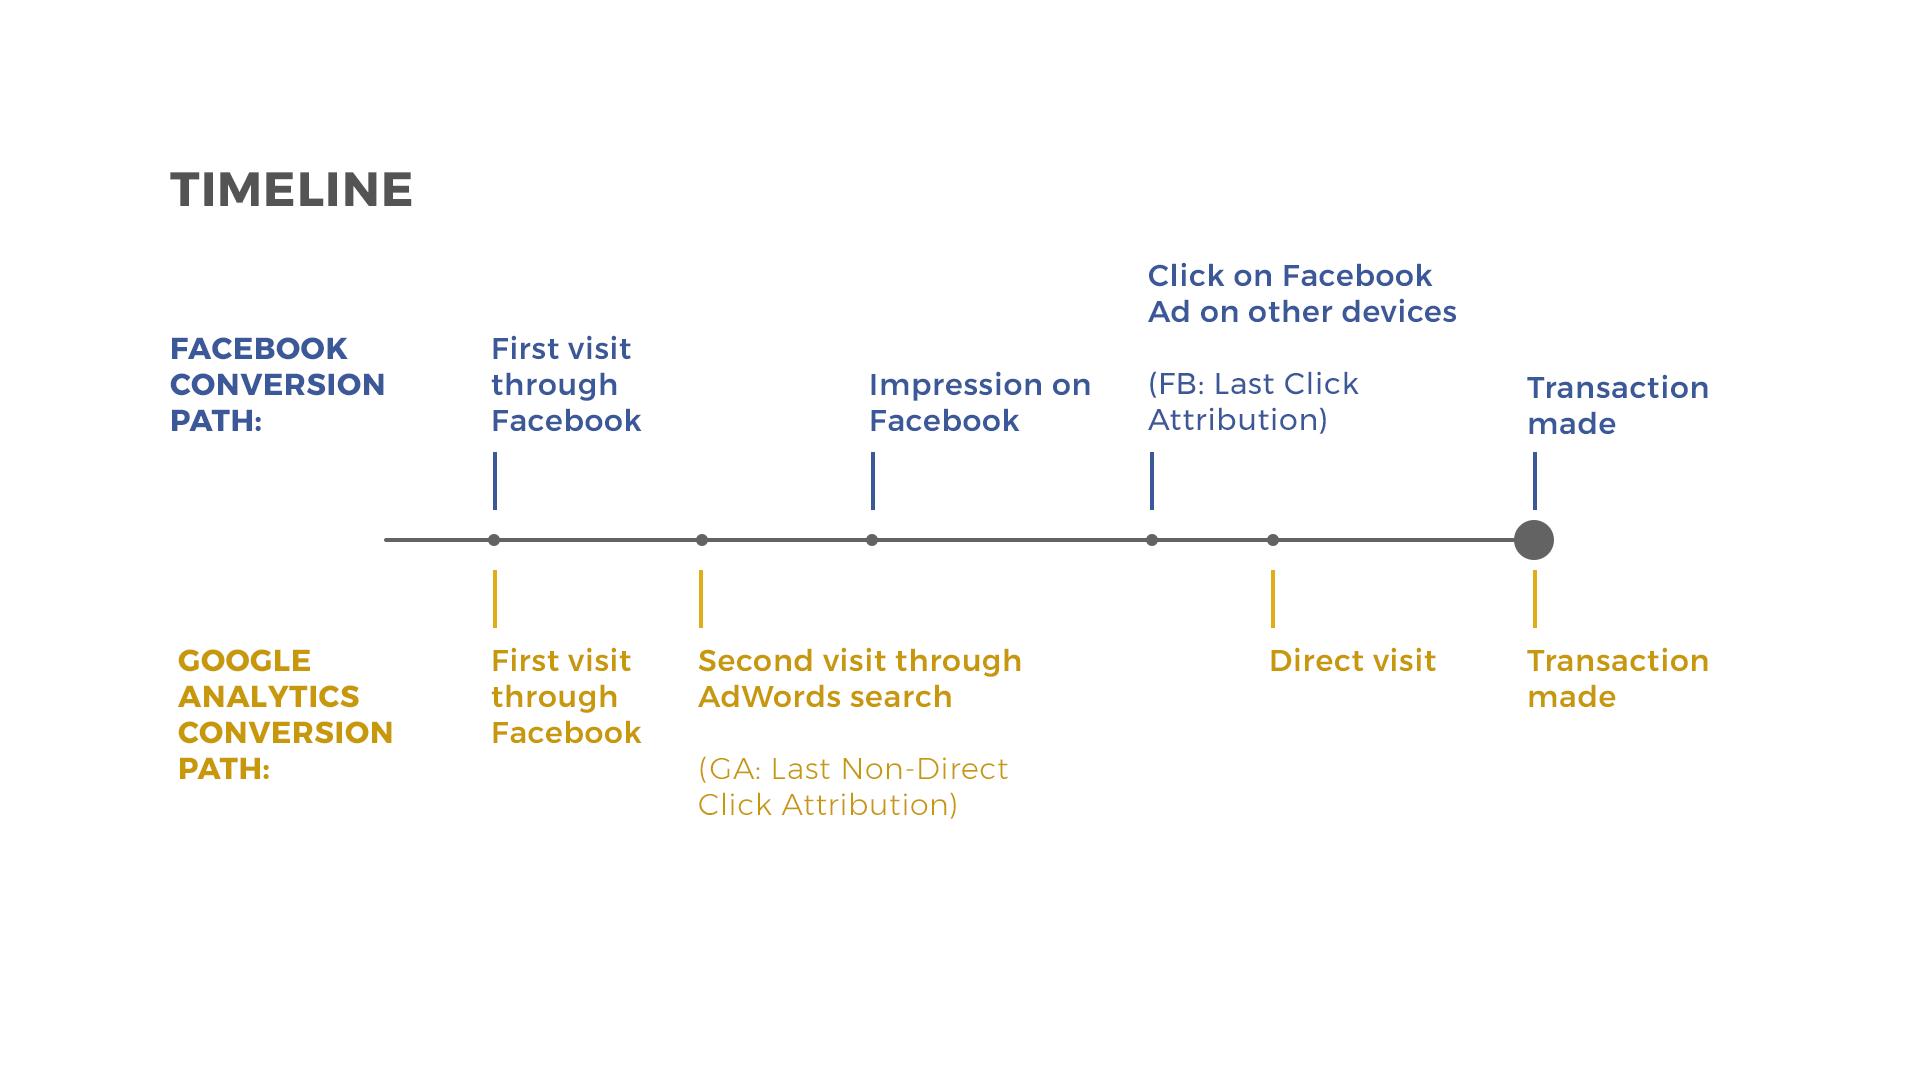 Timeline of attribution for Google and Facebook